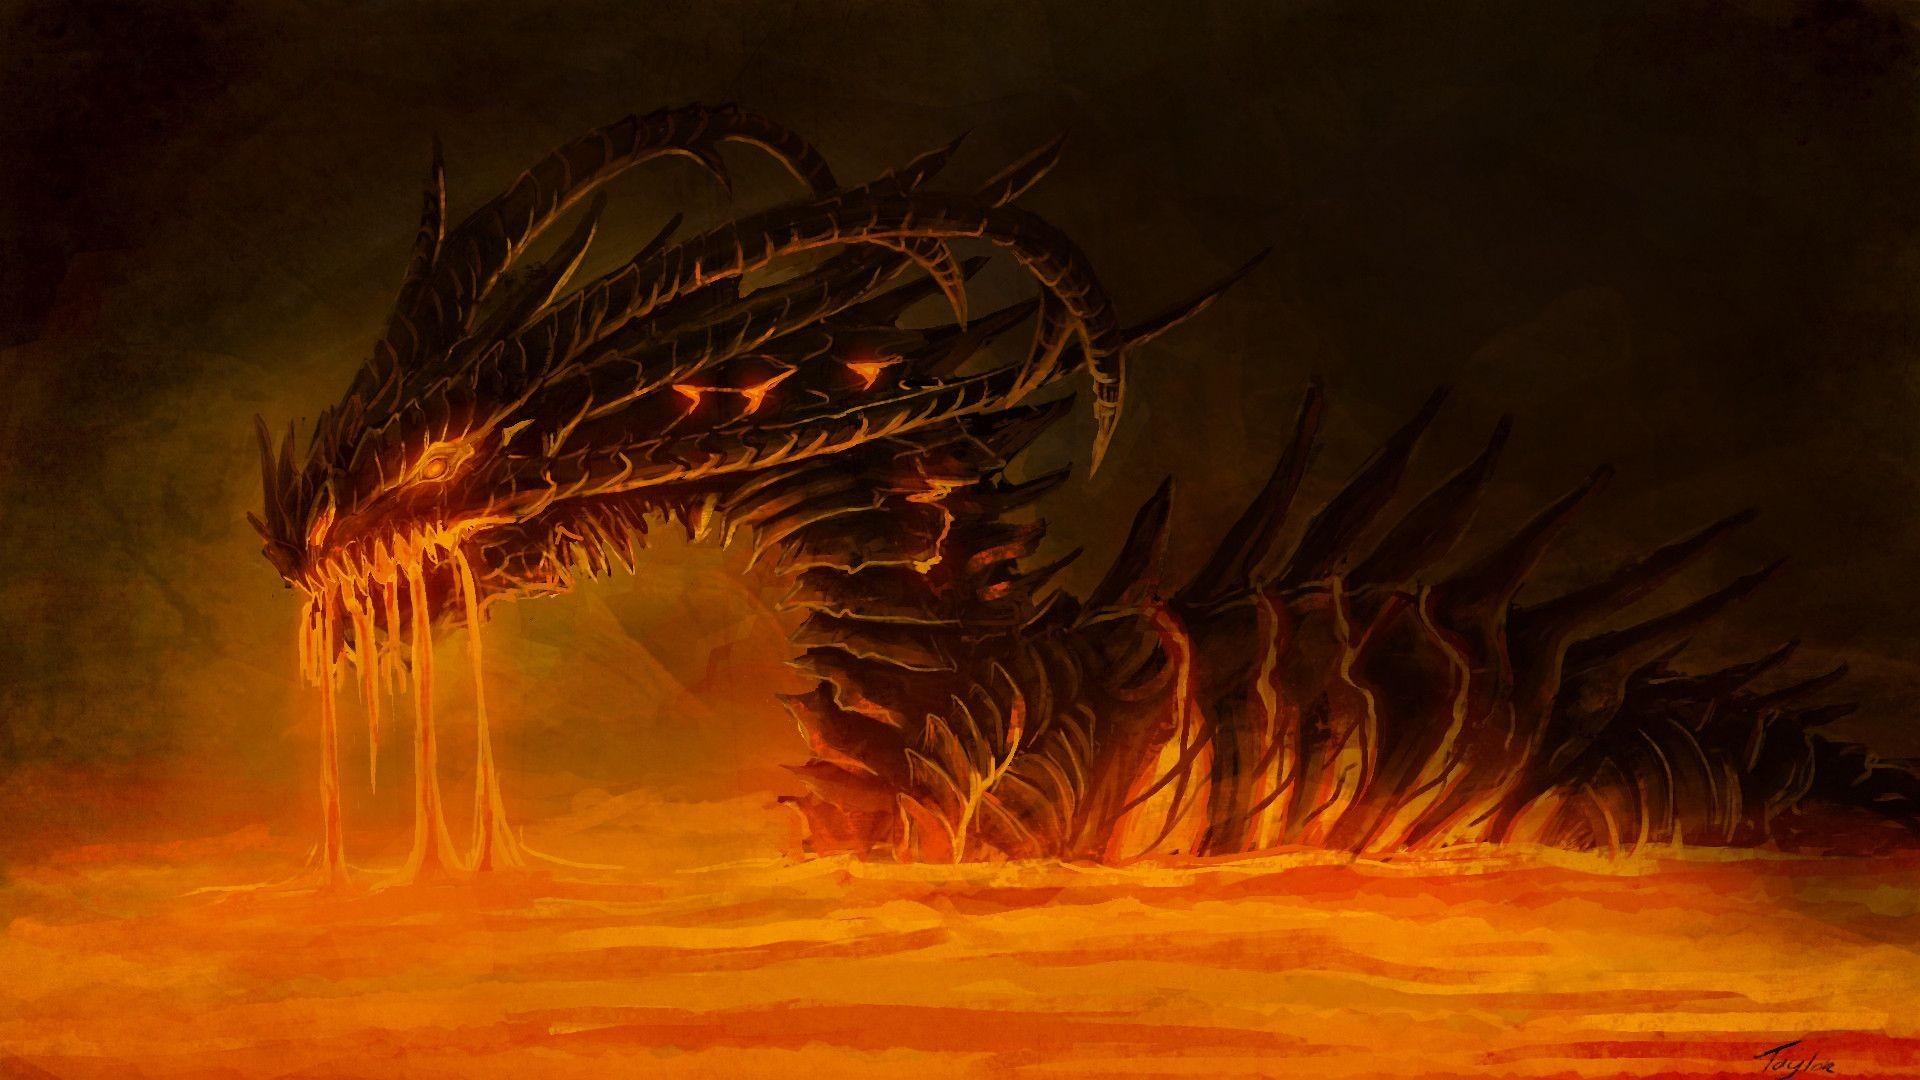 1920x1280 Badass Dragon Wallpapers Free